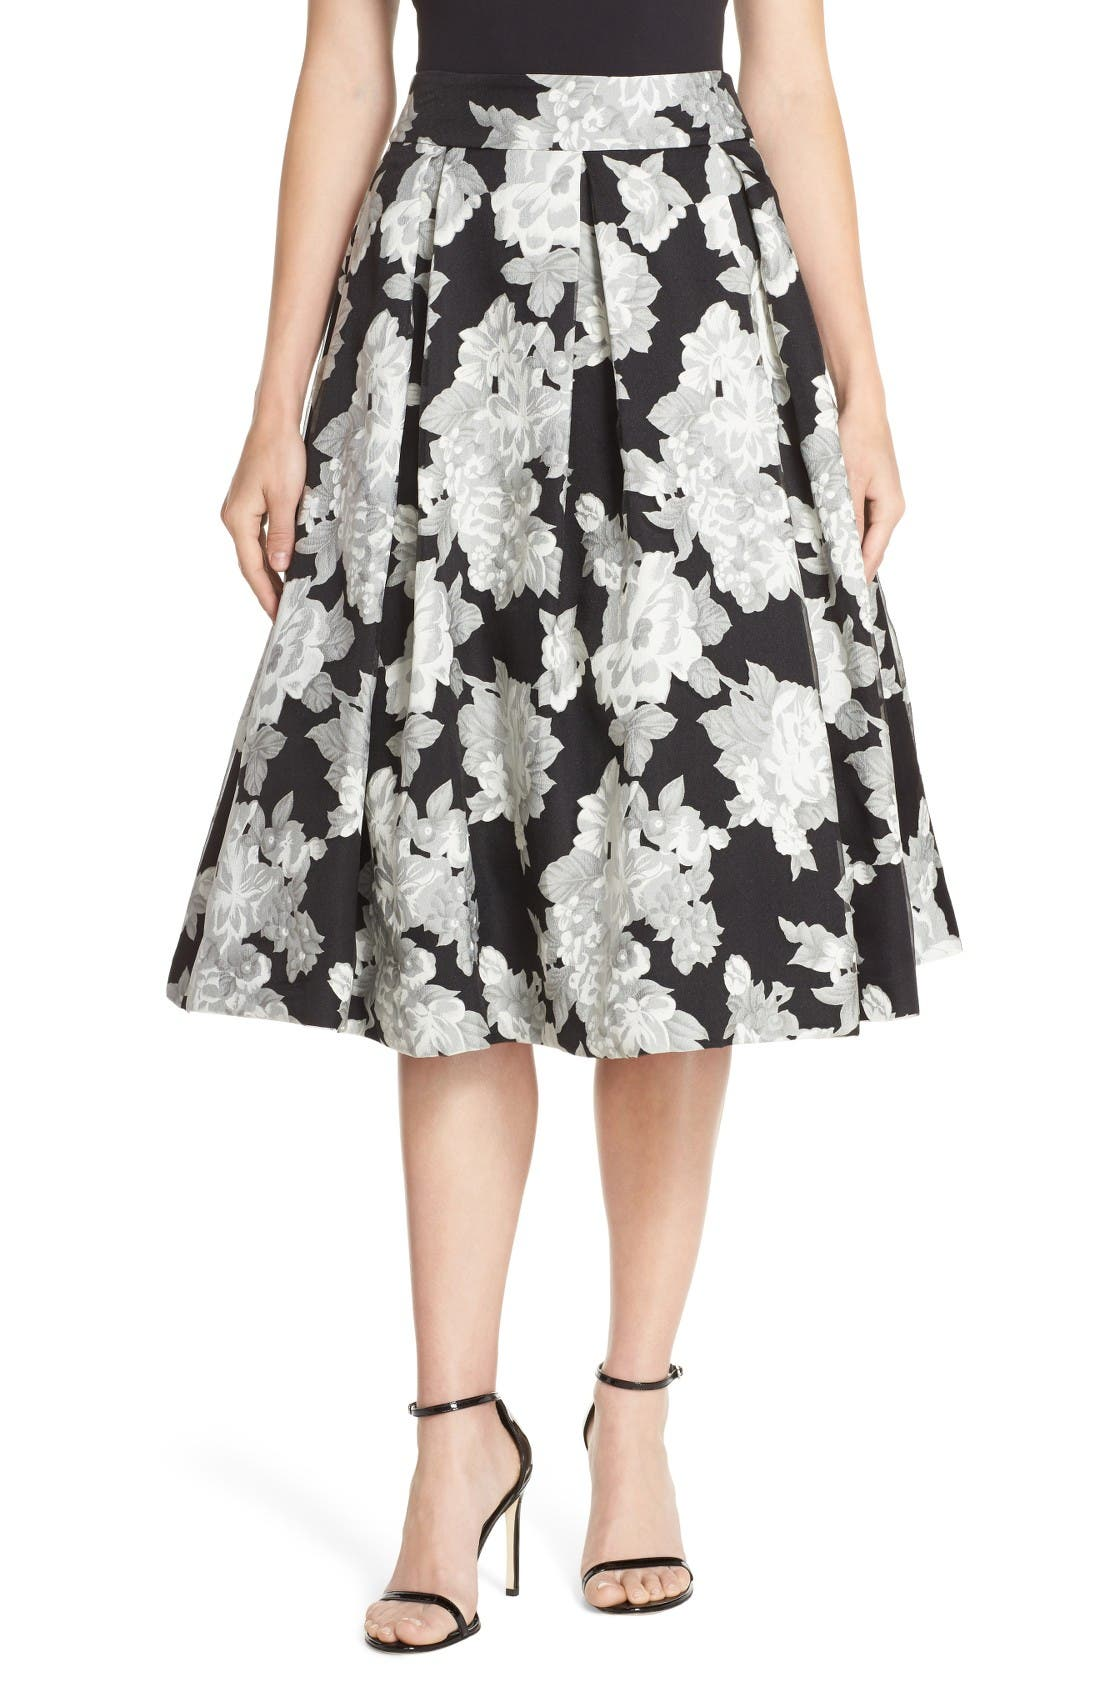 Alternate Image 1 Selected - Eliza J Floral Print Organza Midi Skirt